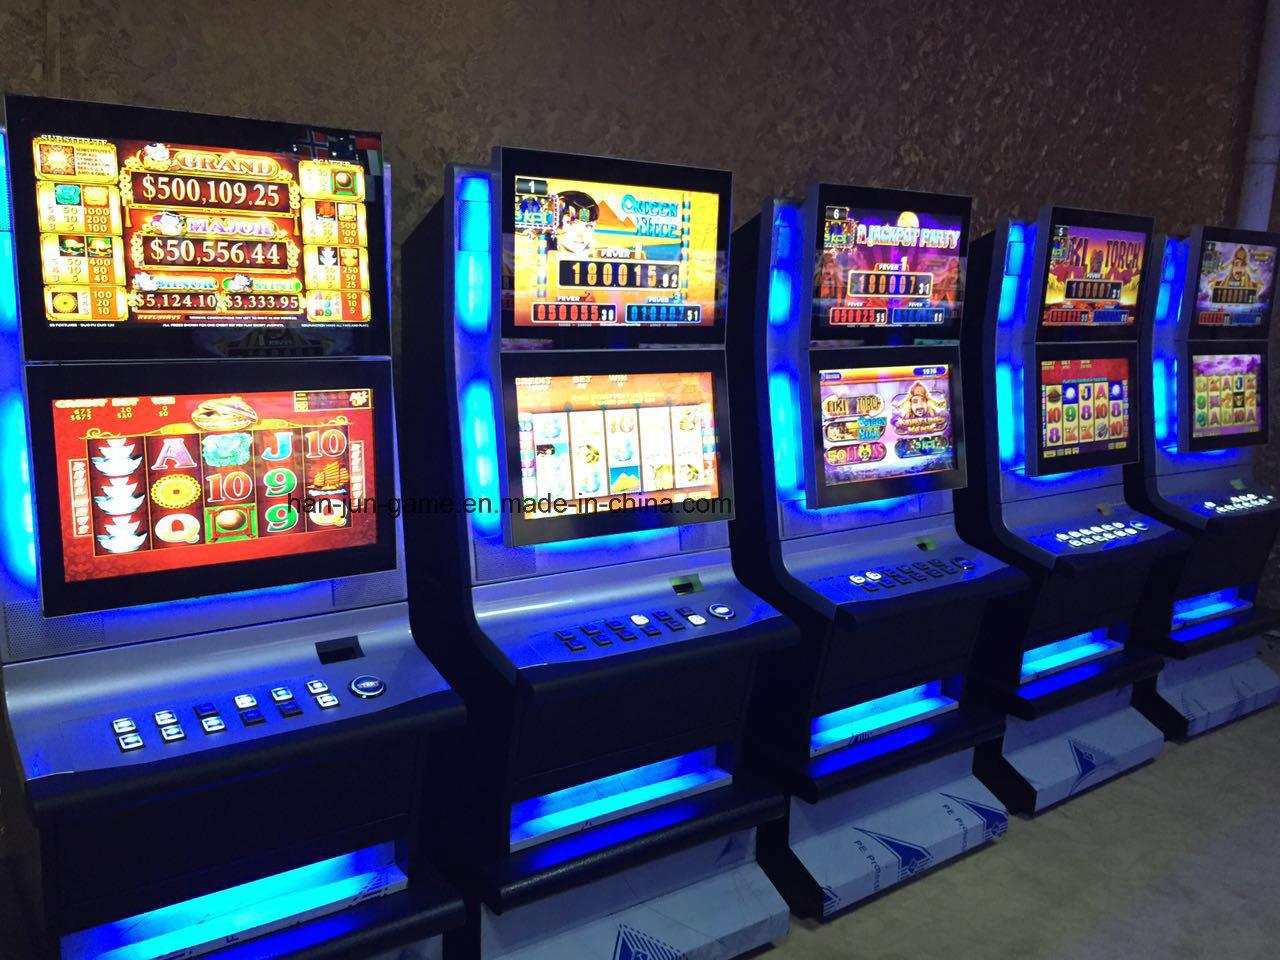 Board gambling casino coushatta louisiana hotels